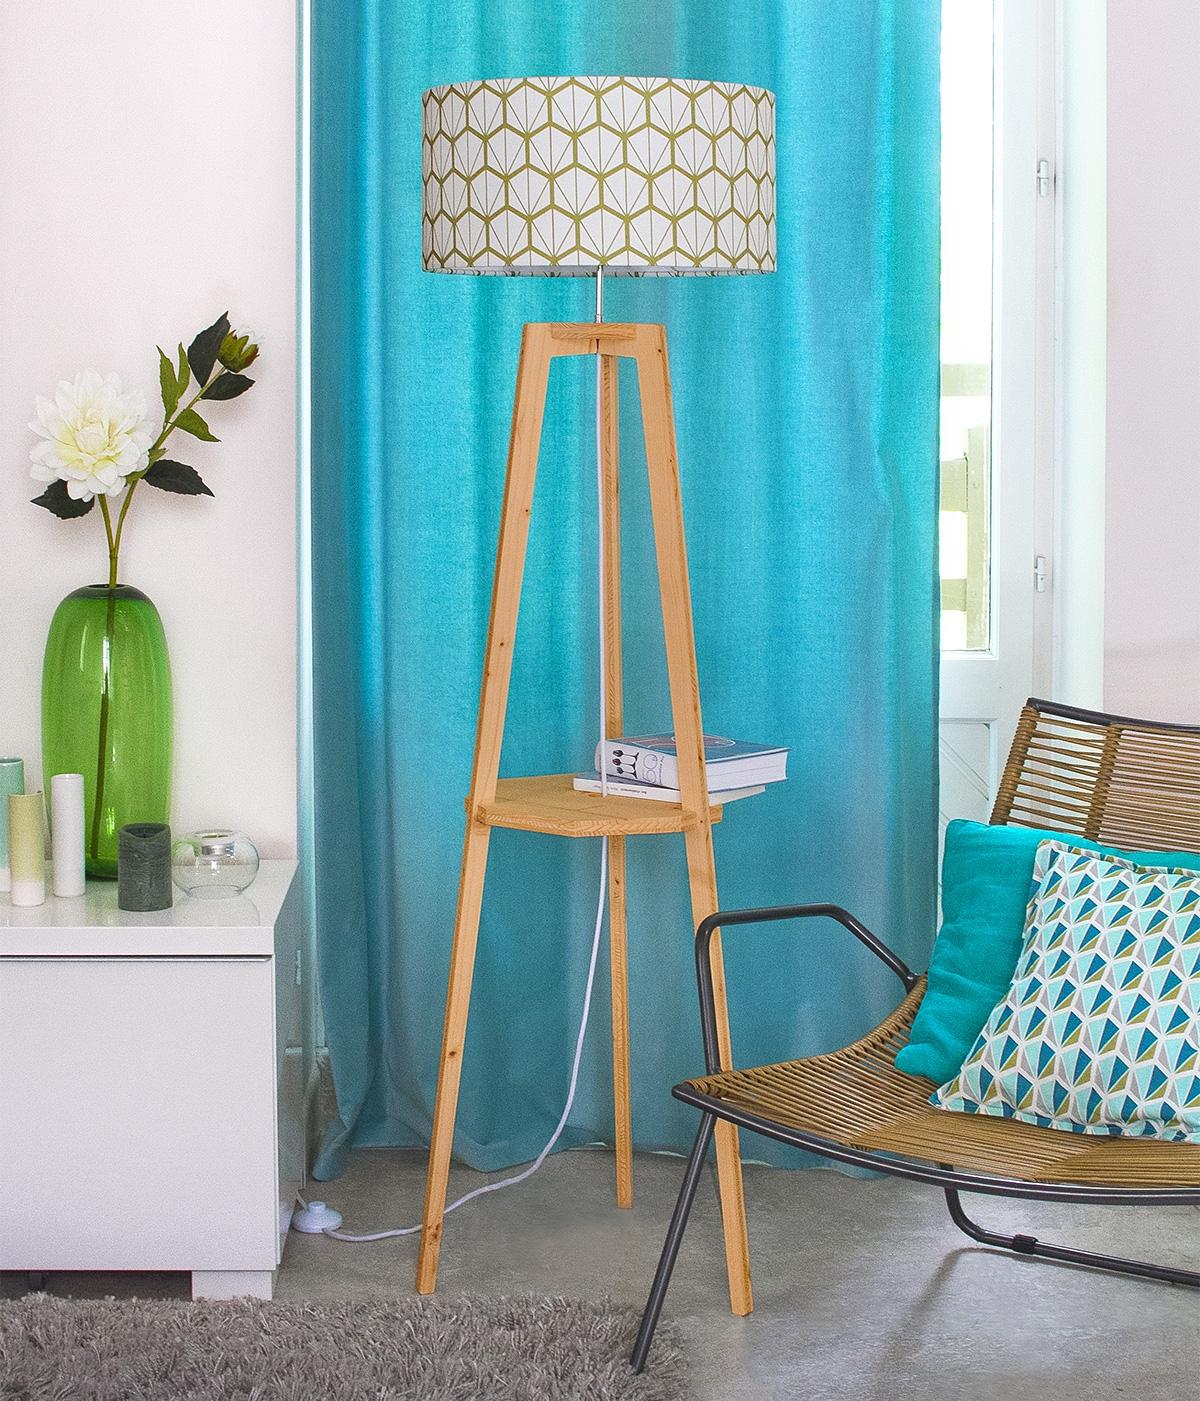 lampadaire-design-fragments-vert-trepied-bois